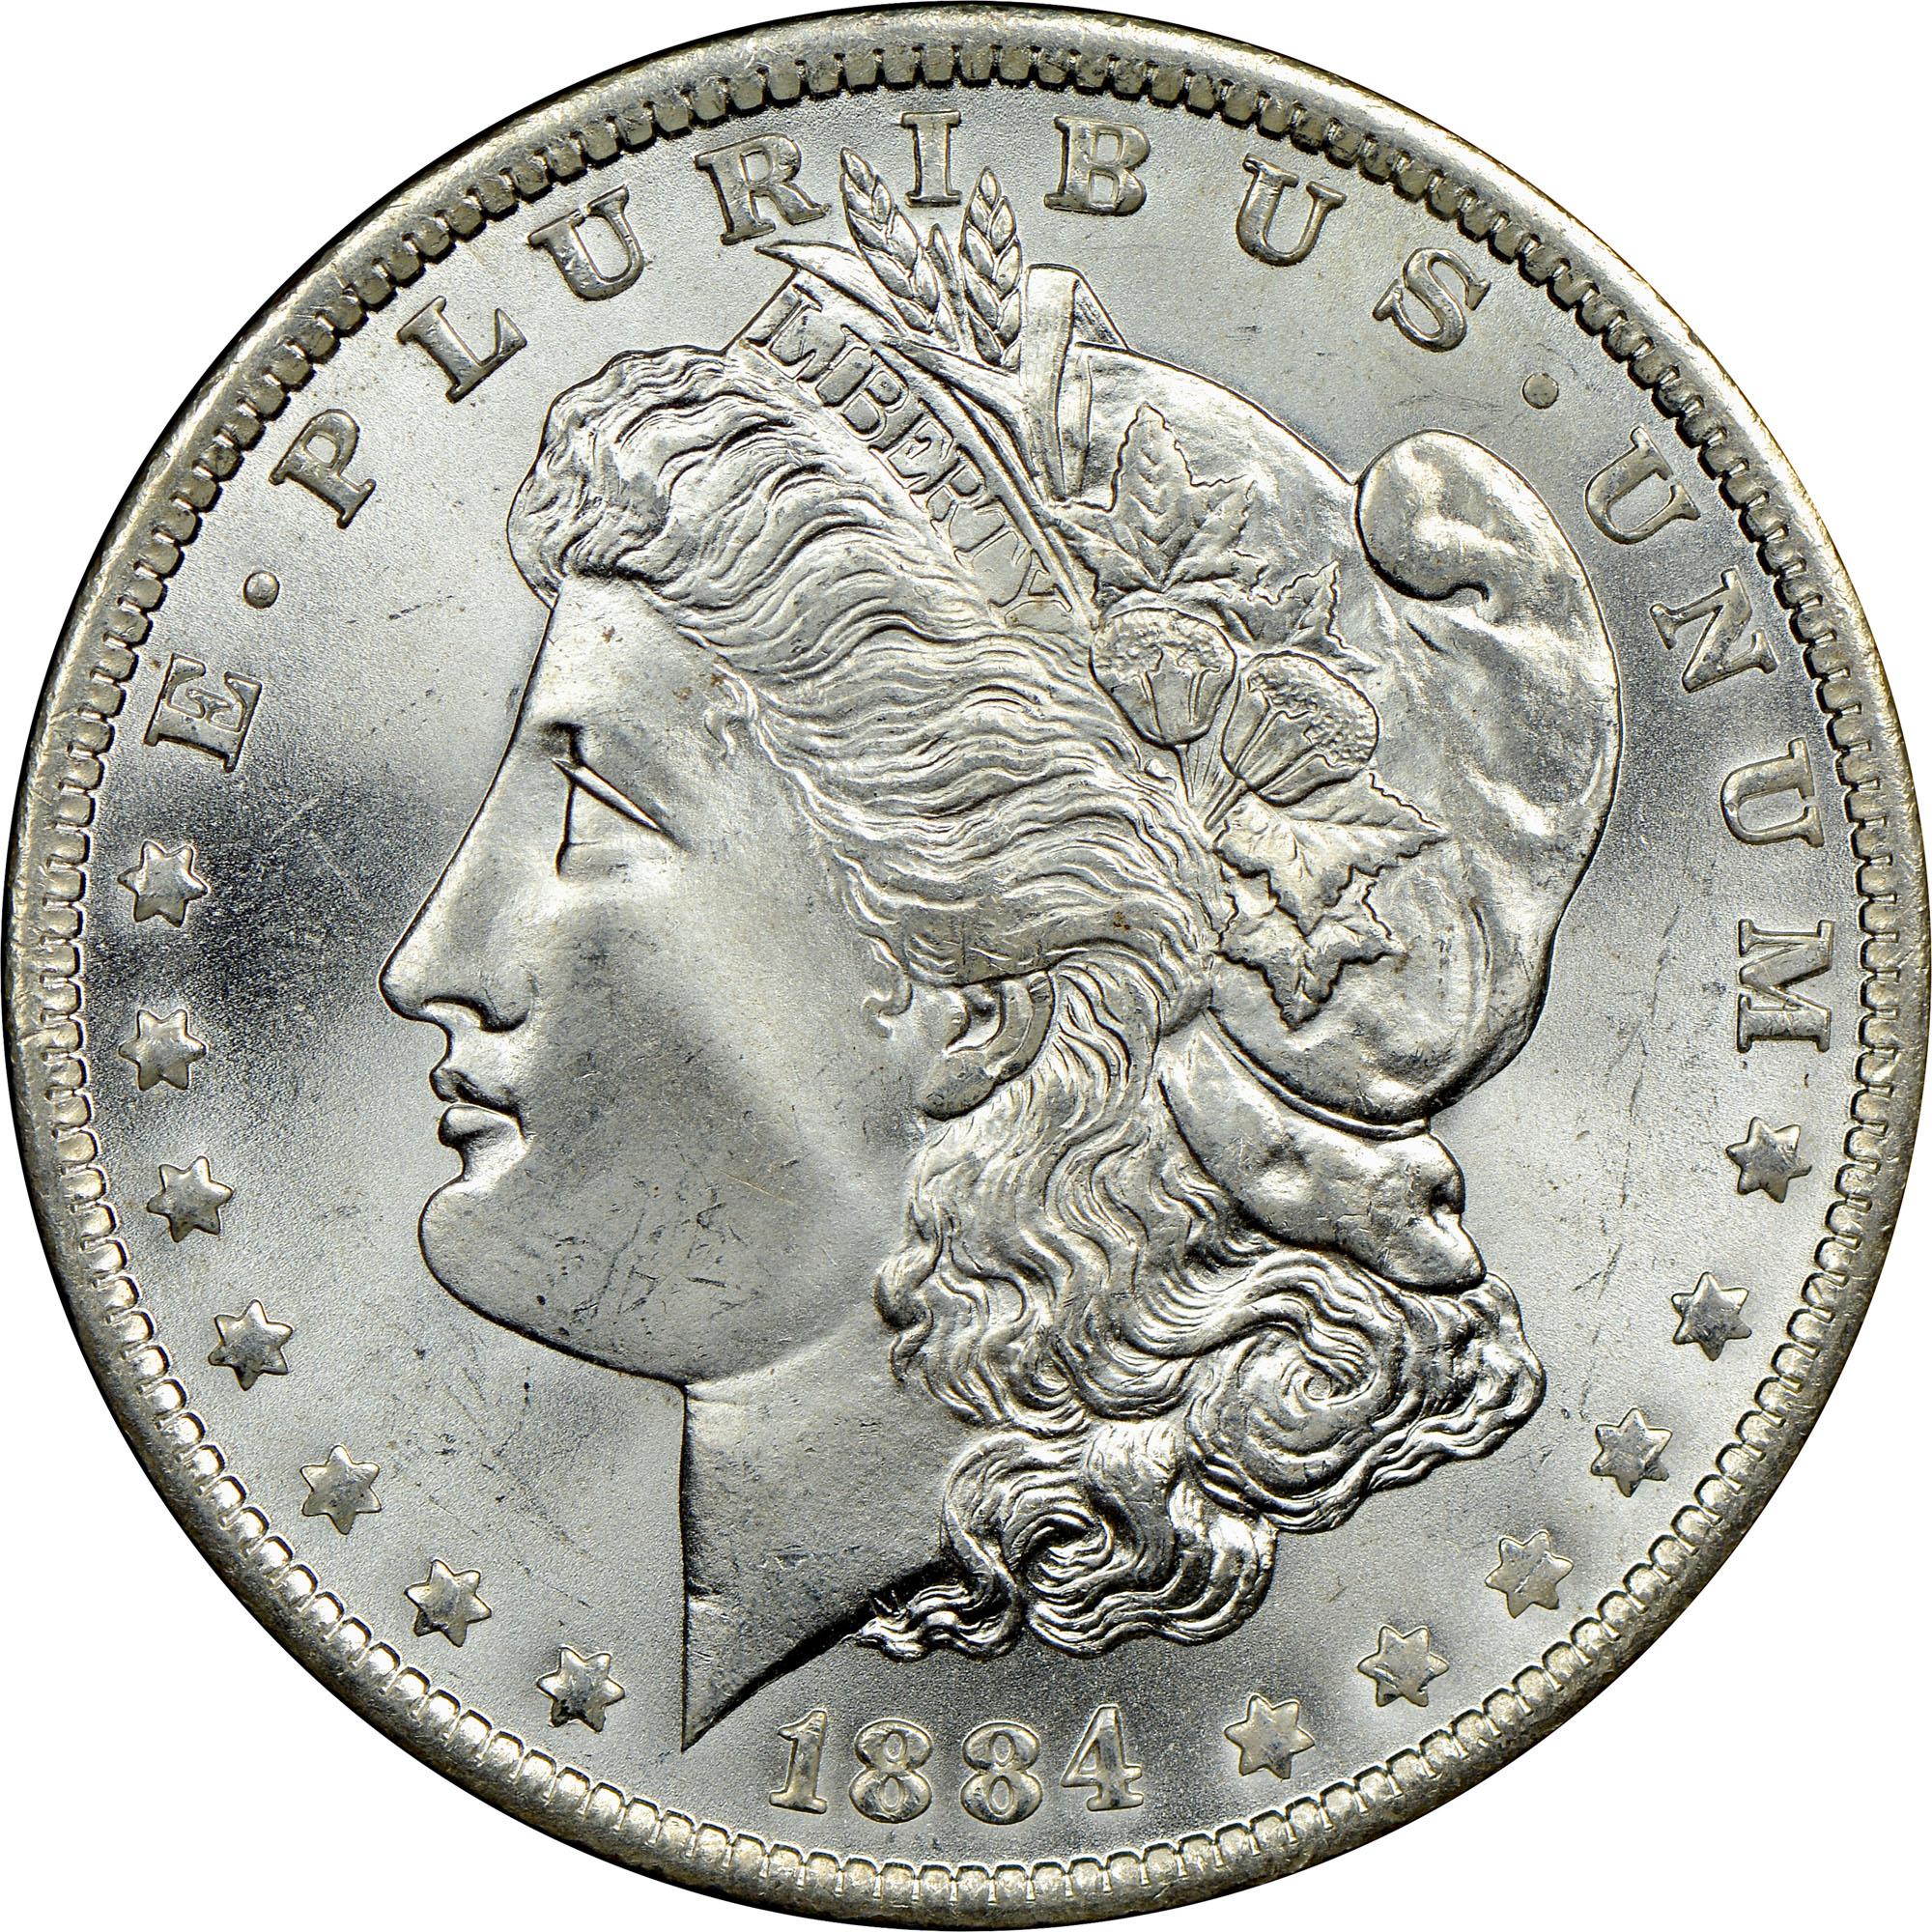 1884 one dollar coin value